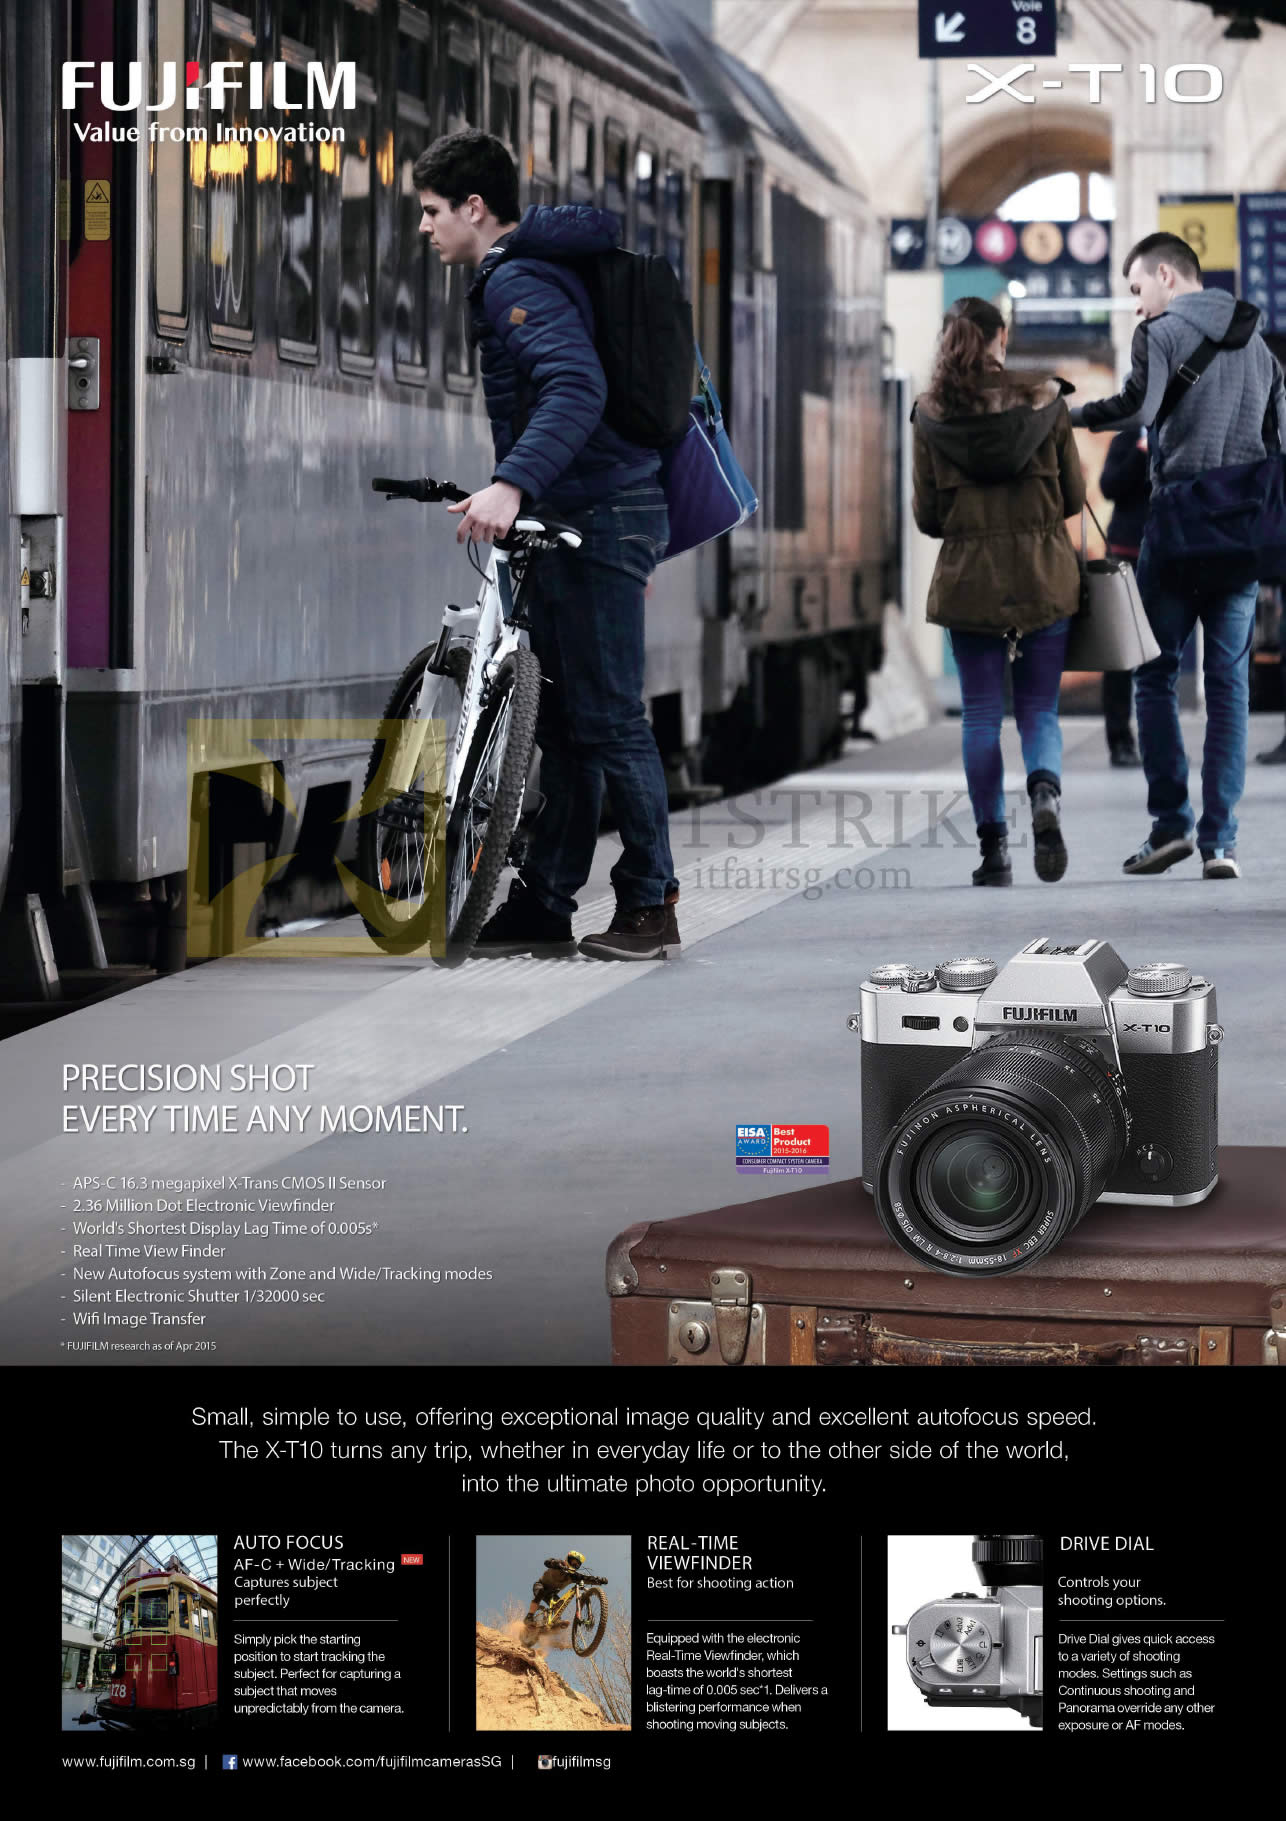 Fujifilm Digital Camera X-T10 Features